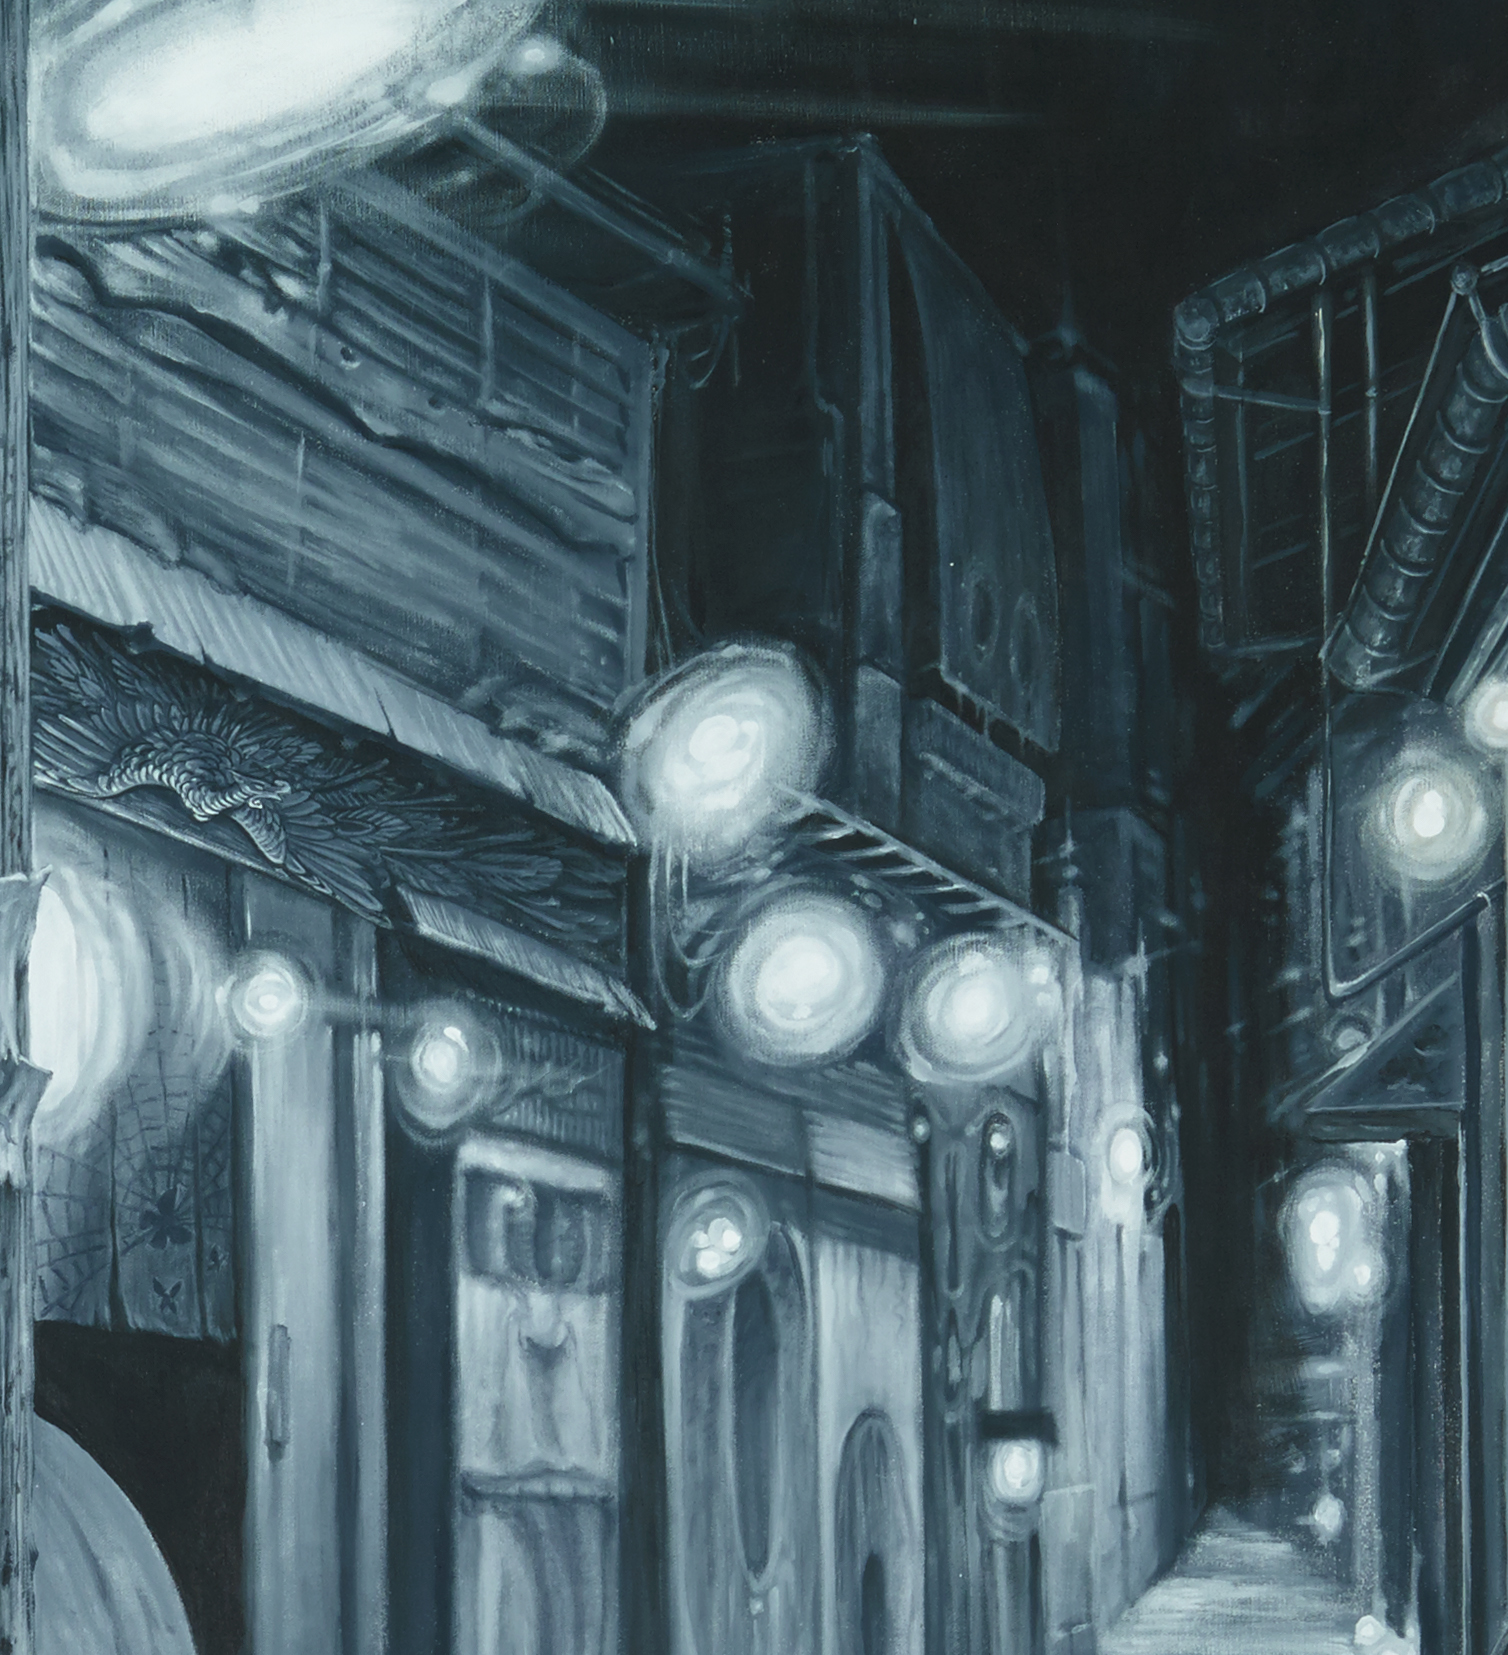 Christopher Brand, Espi, Evan Skrederstu & Steve Martinez. Yokai Street . Detail. 2014 - acrylic on canvas. 6' x 8'.